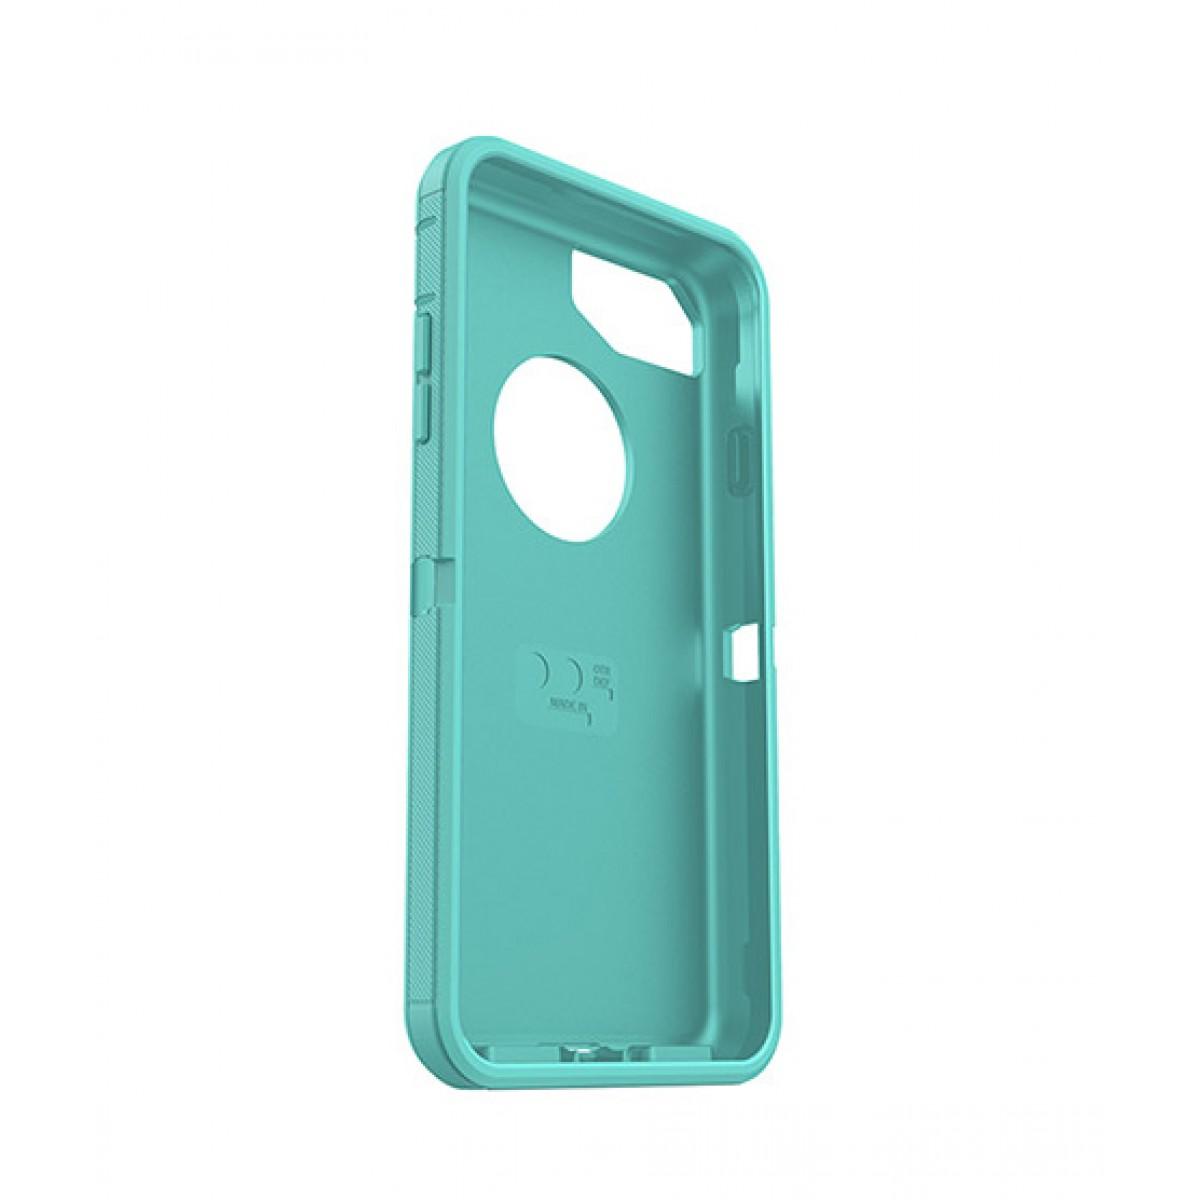 best website 1e3a9 bb712 OtterBox Defender Series Slipcover Case Aqua Mint for iPhone 7